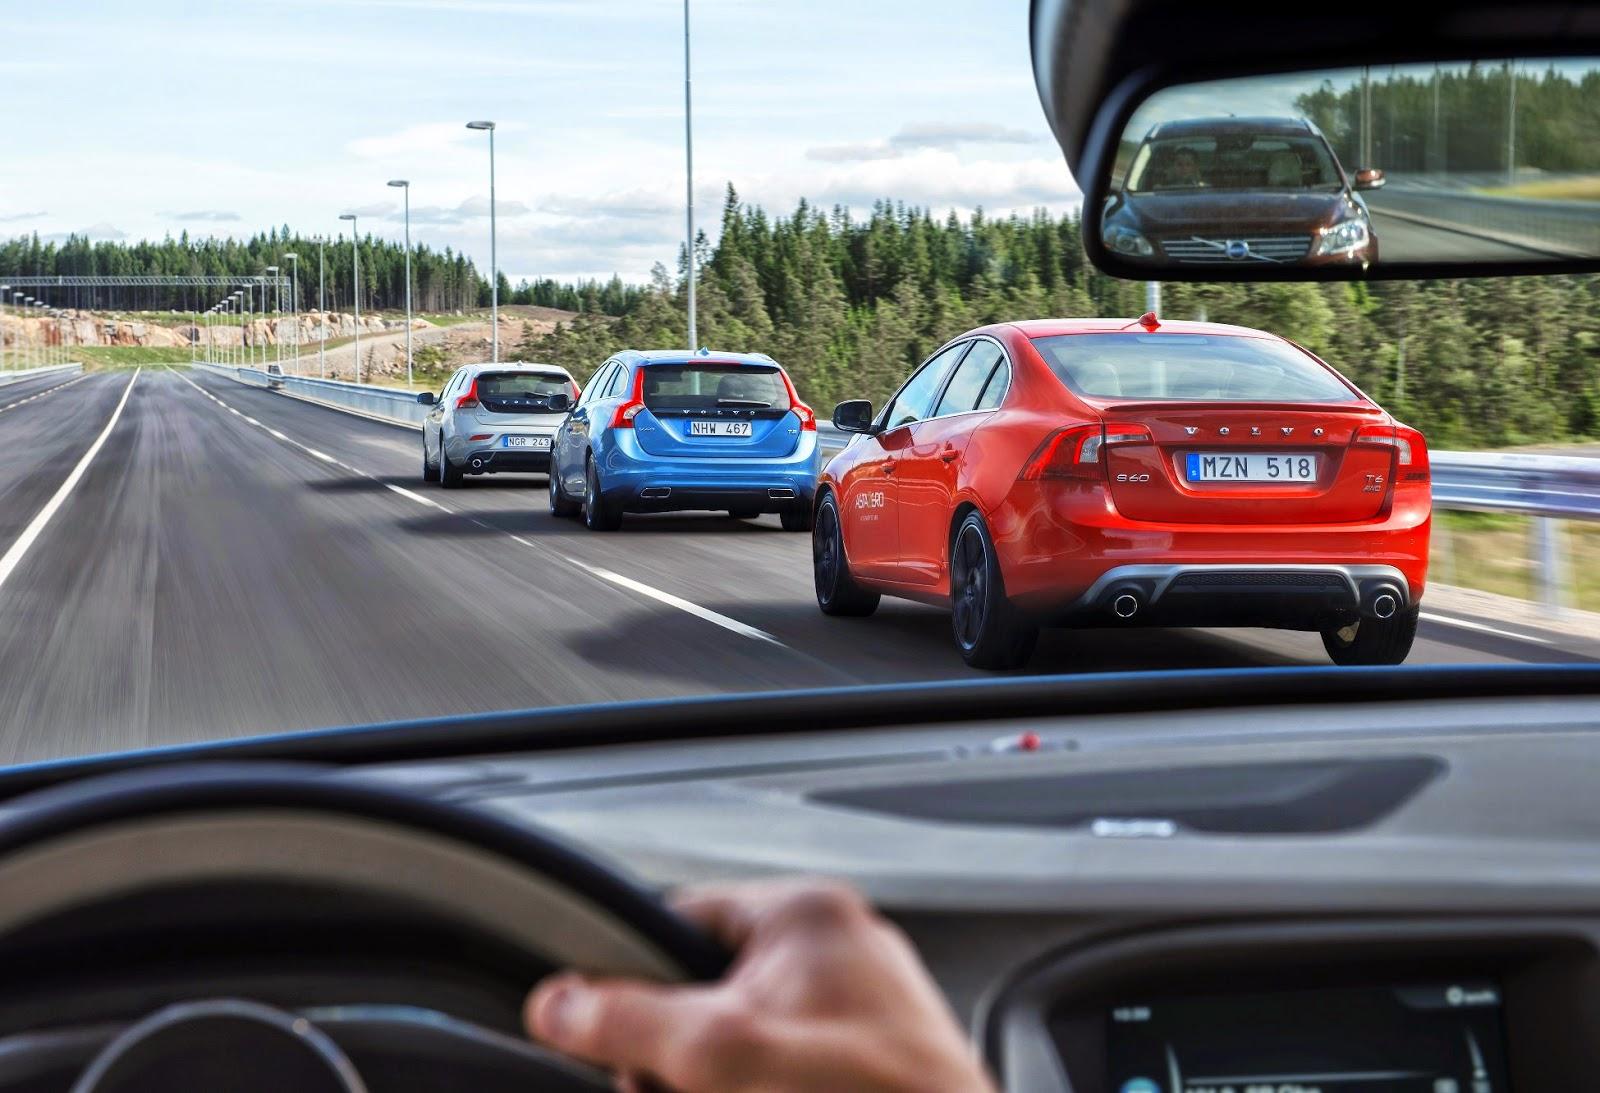 AstaZero: Η Volvo εγκαινιάζει την πιο σύγχρονη πίστα δοκιμών στον κόσμο, κοντά στο Γκέτεμποργκ